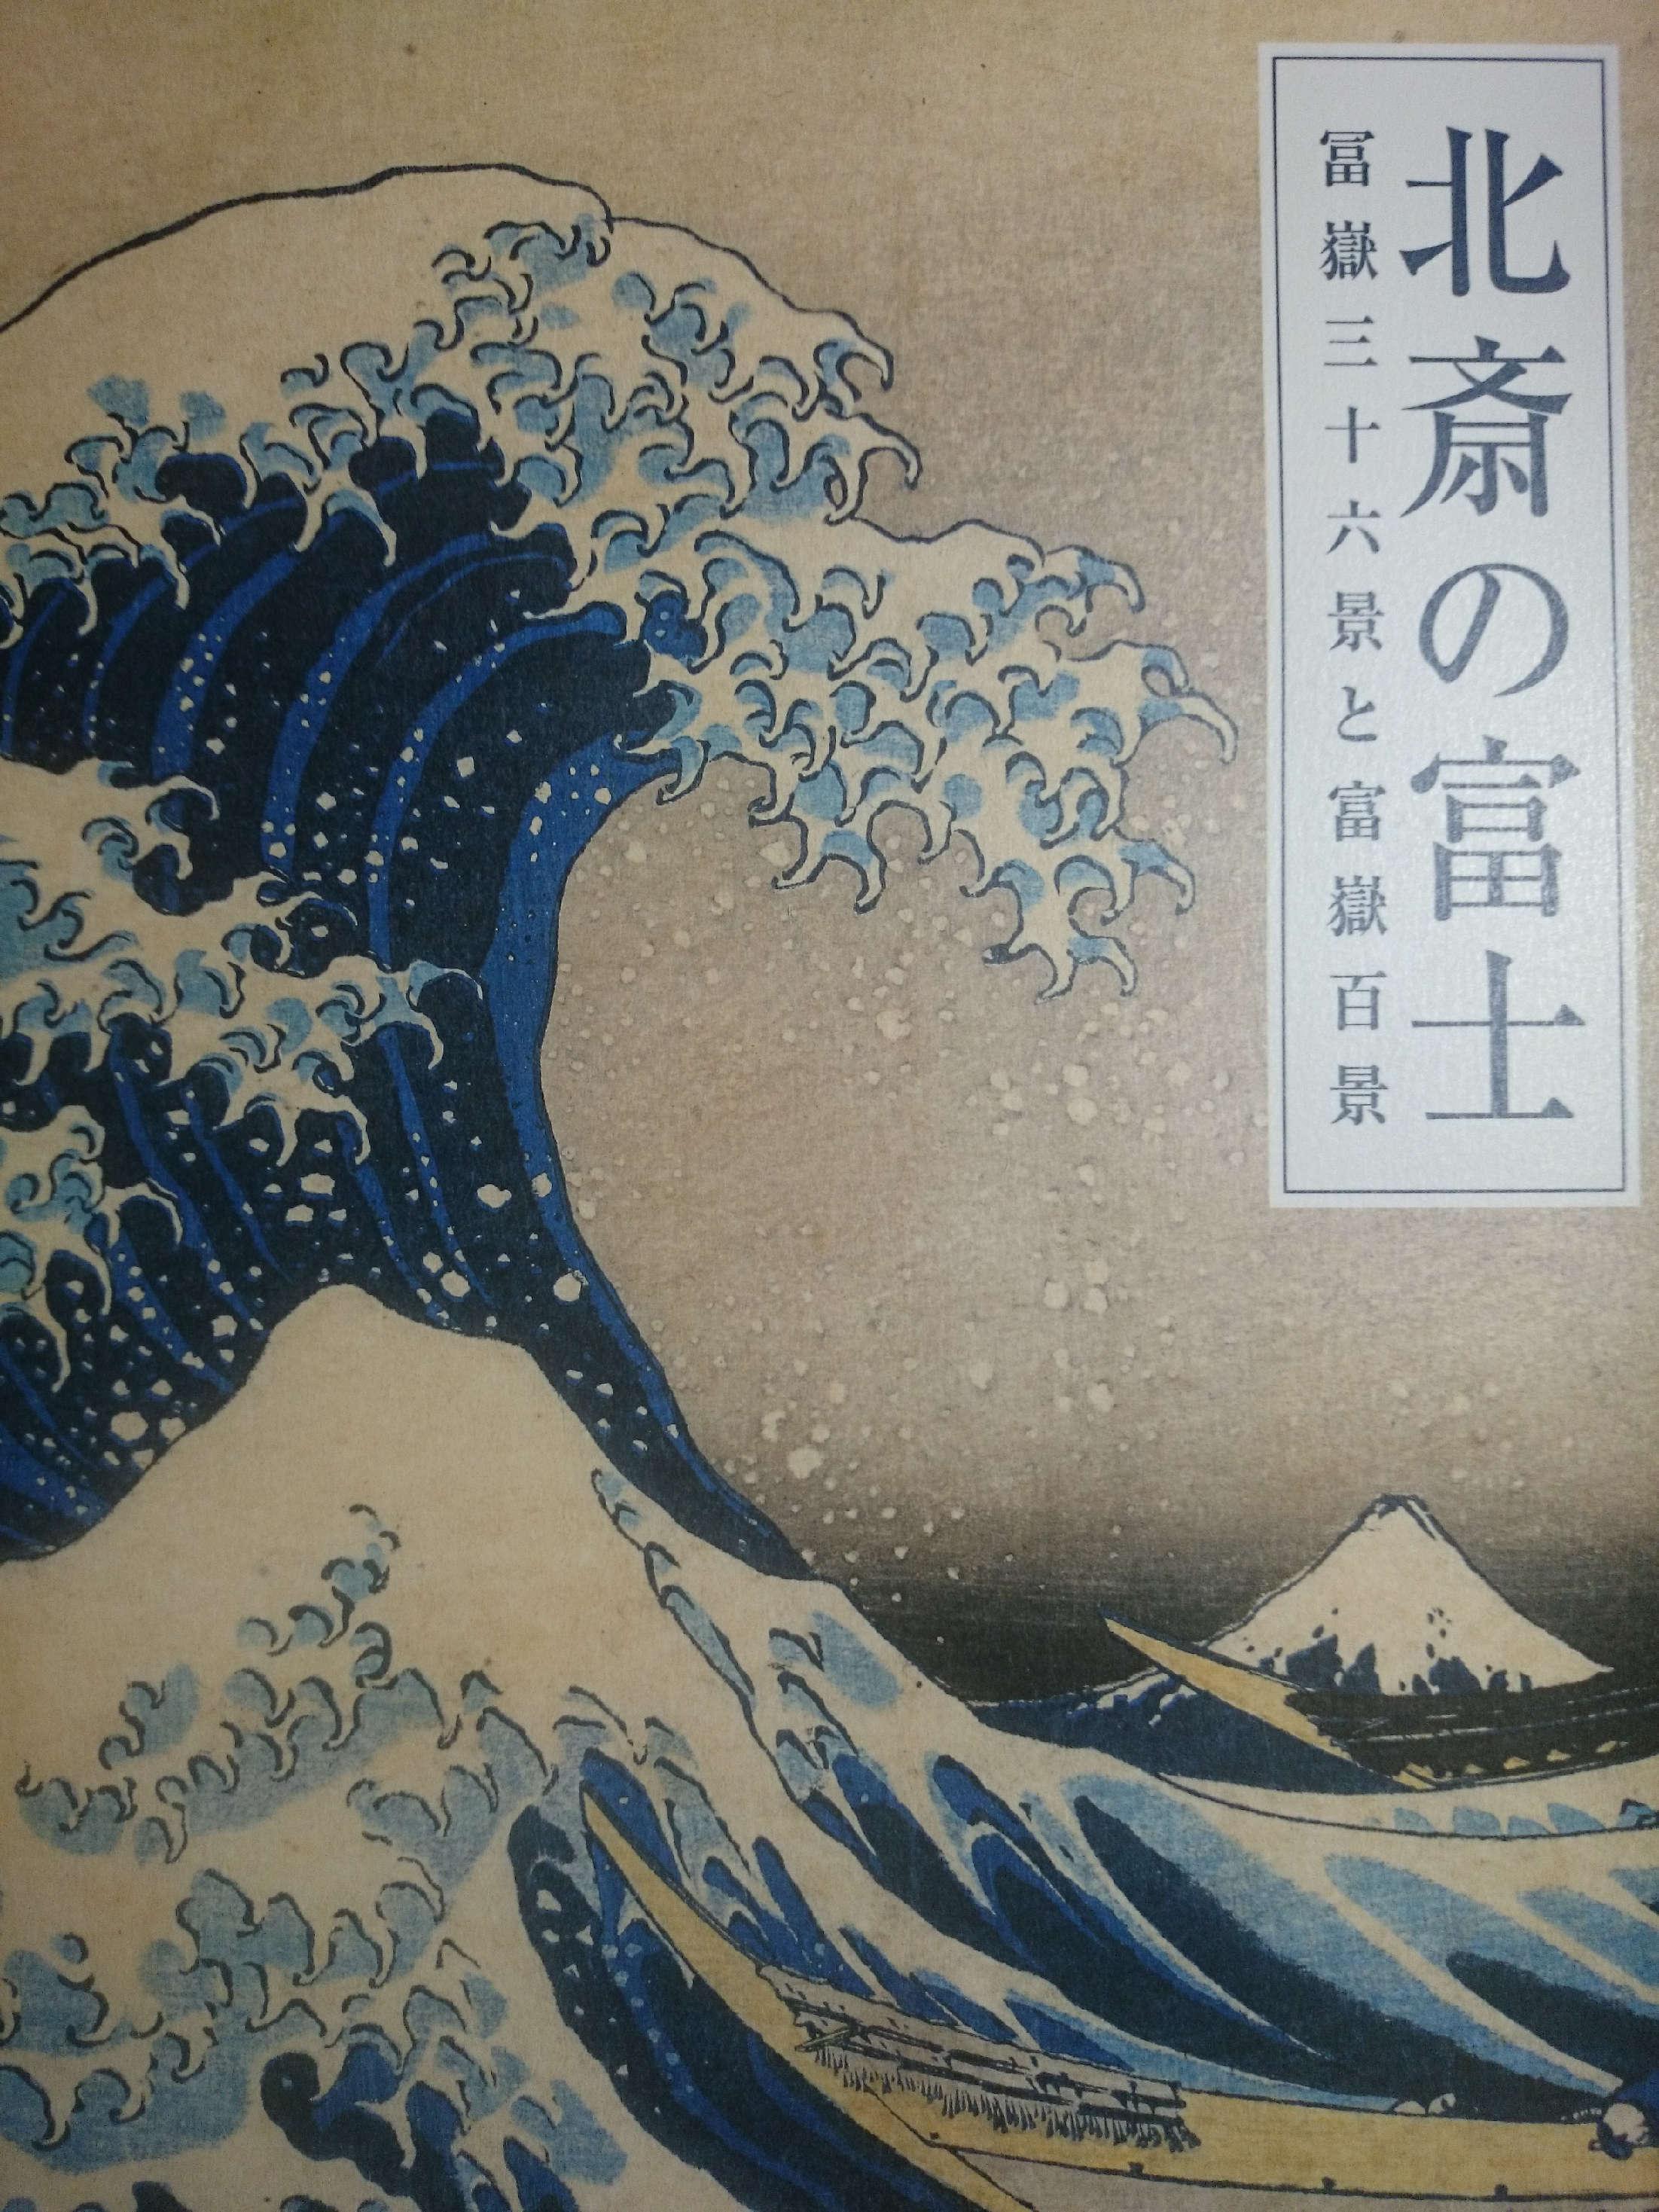 北斎の富士 富嶽三十六と富嶽百景